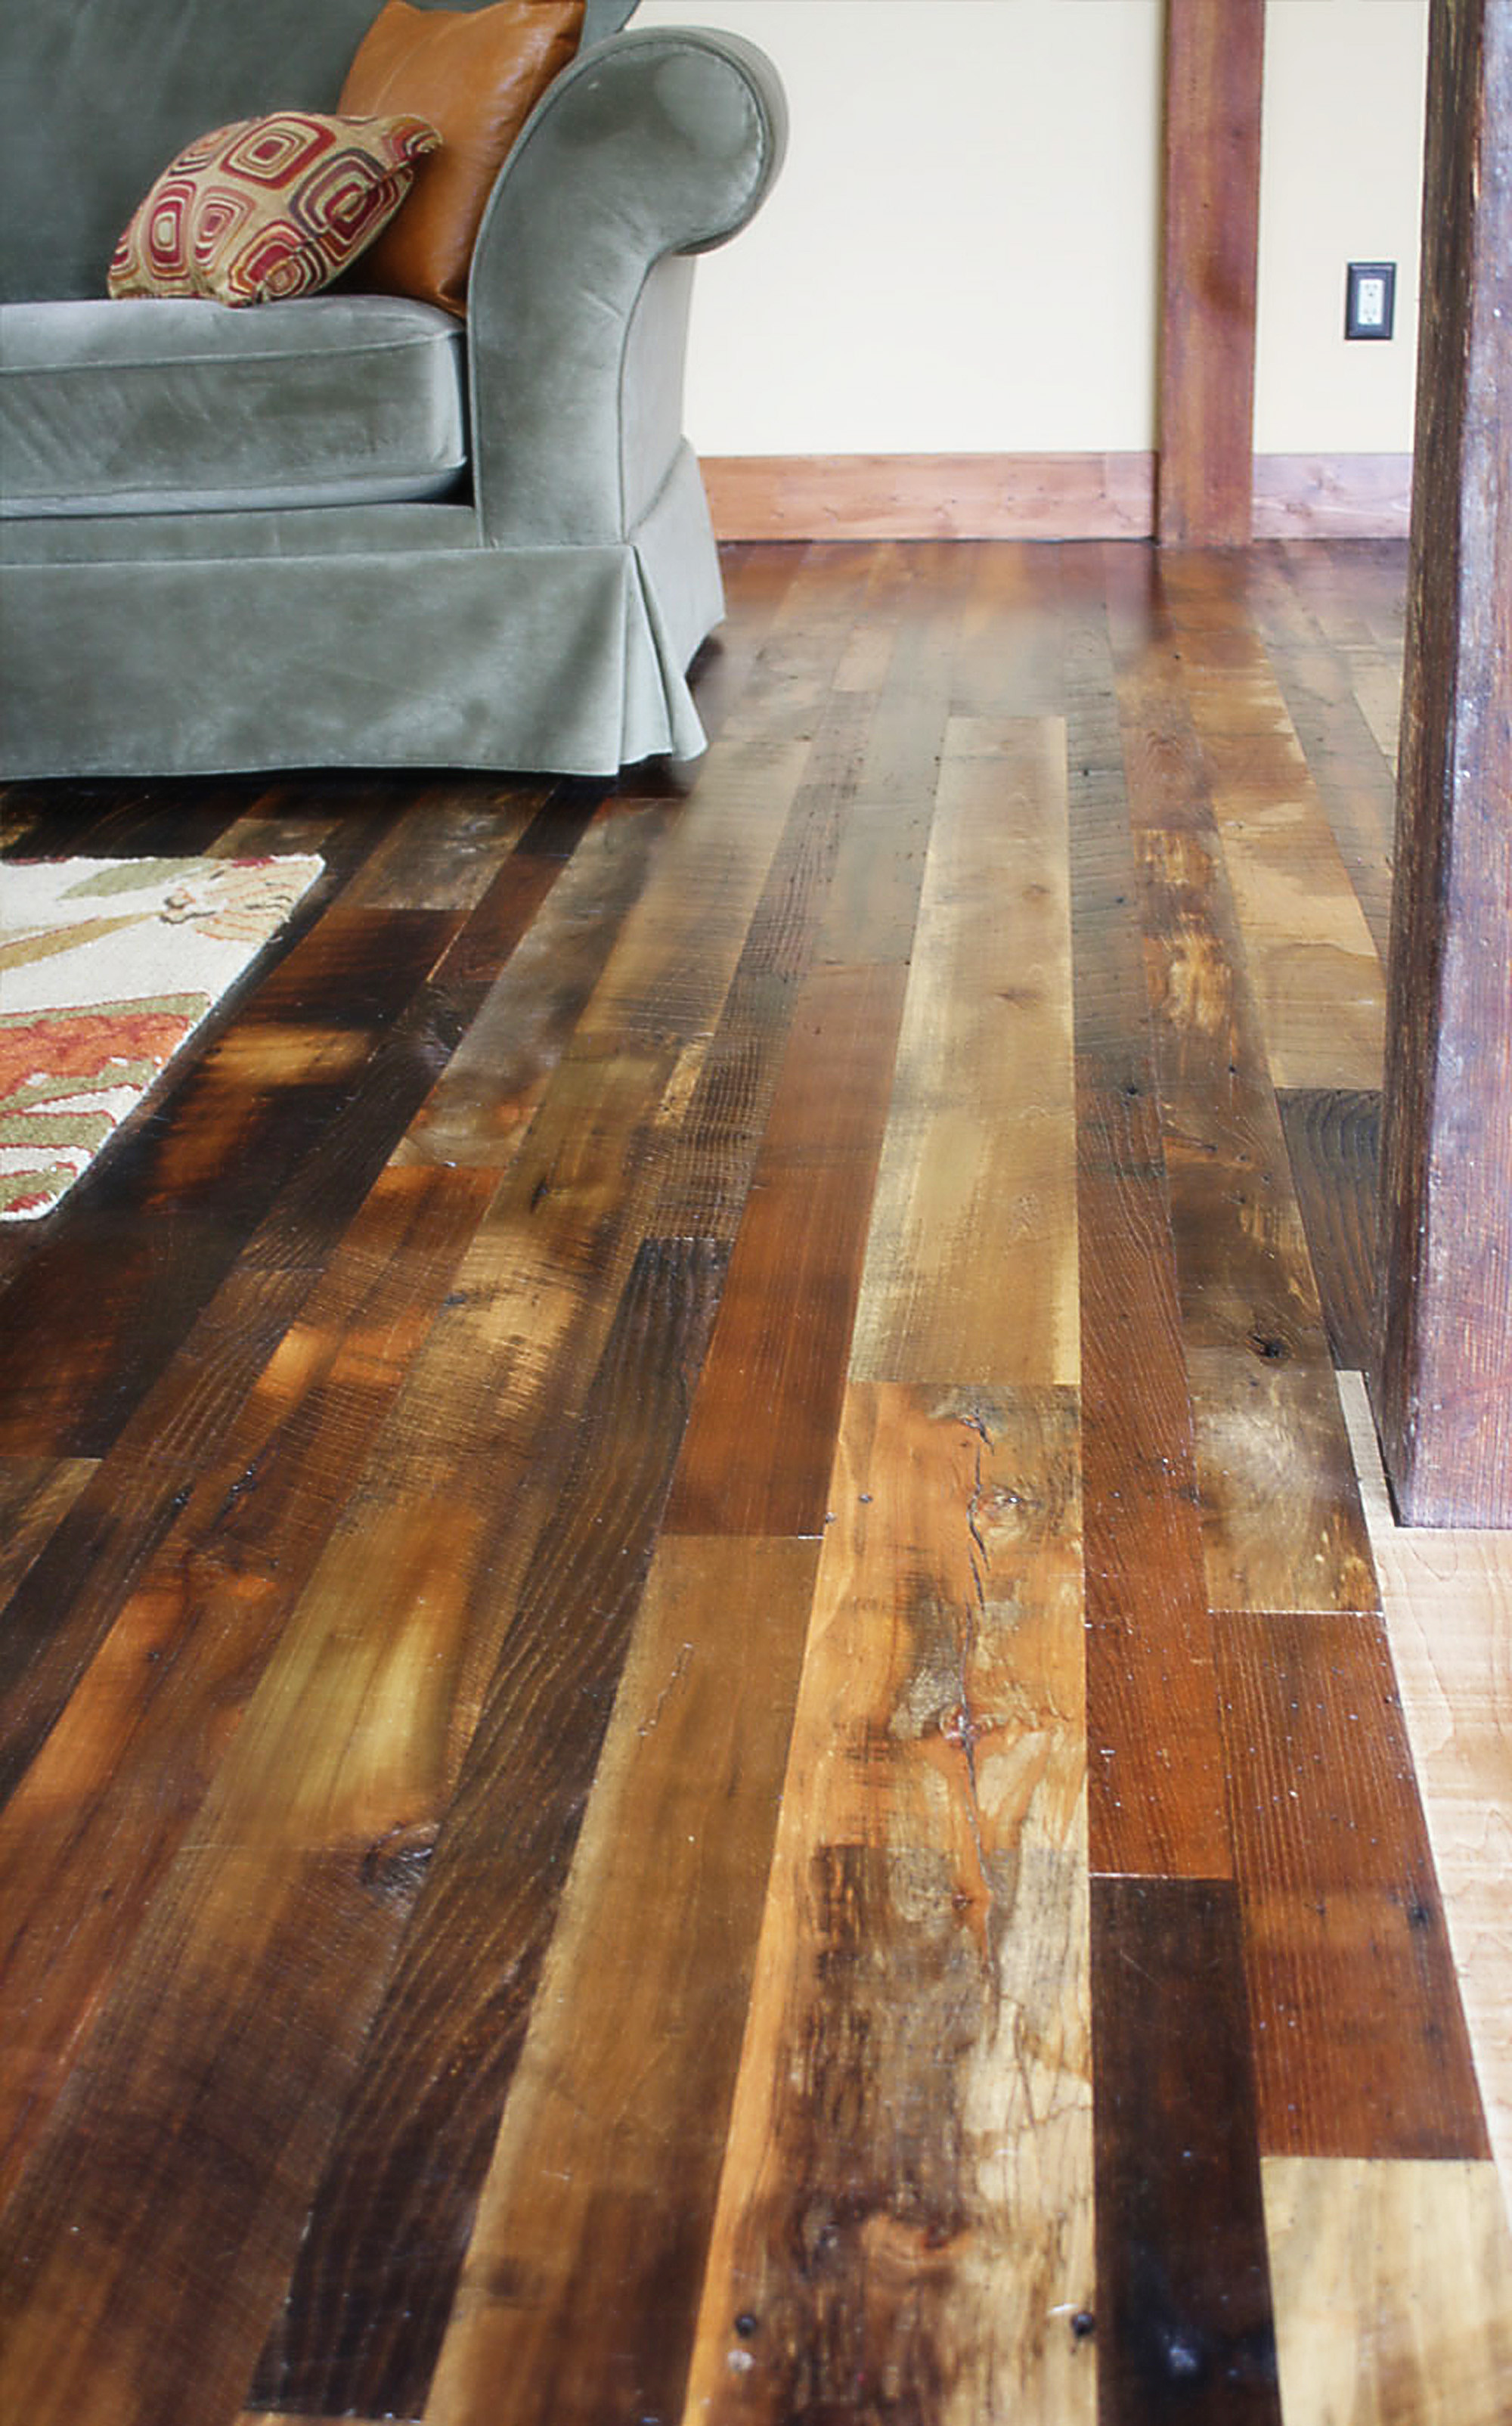 7 hardwood flooring of rustic hand scraped hardwood flooring sevenstonesinc com with attractive distressed rustic wood flooring for floor